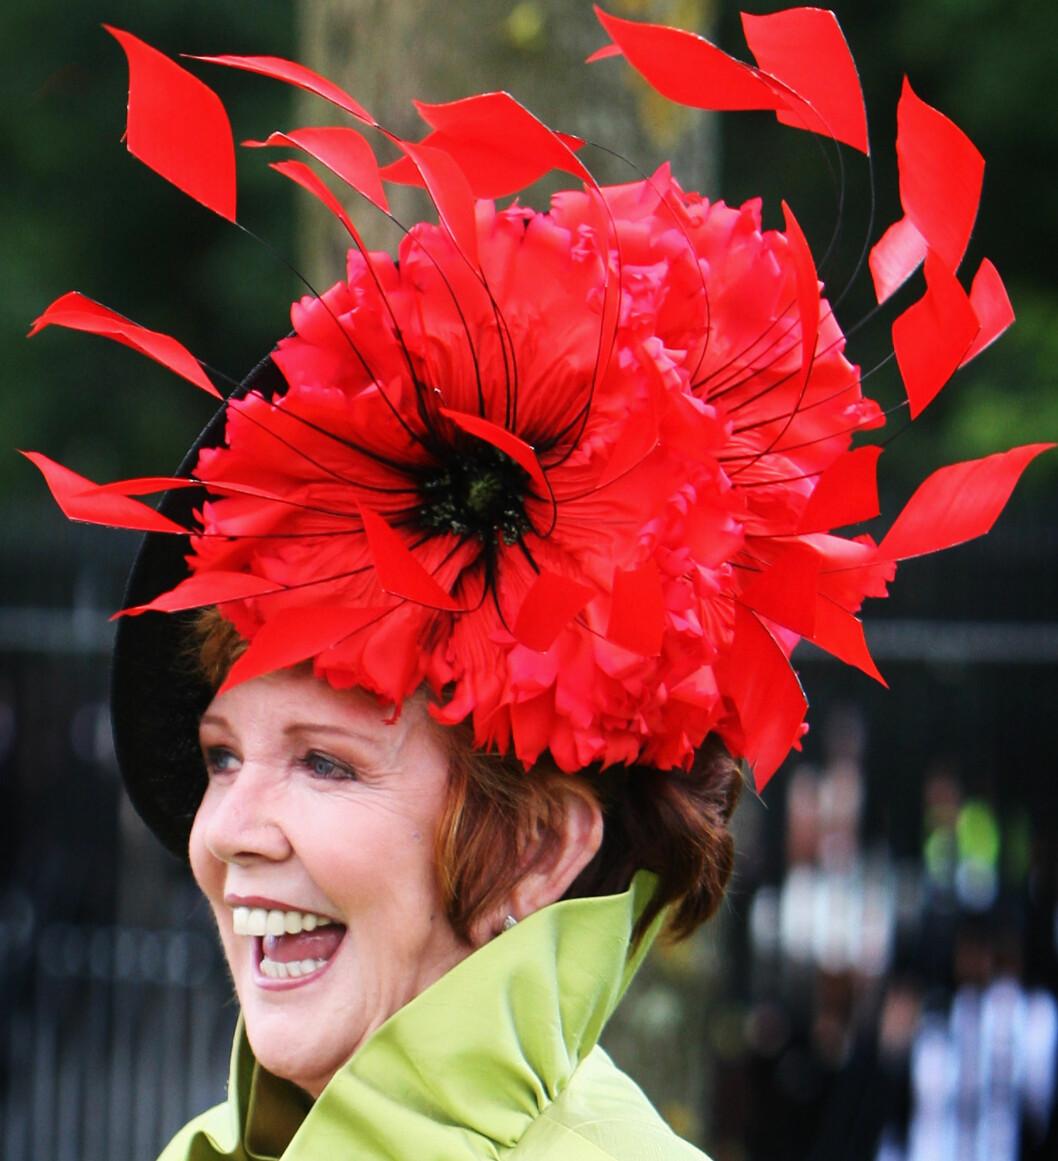 En strålende opplagt Cilla Black, Englands 60-talls popstjerne og tv-kjendis, med en enorm rød blomst snedig dandert på hodet på årets Ascot.  Foto: All Over Press